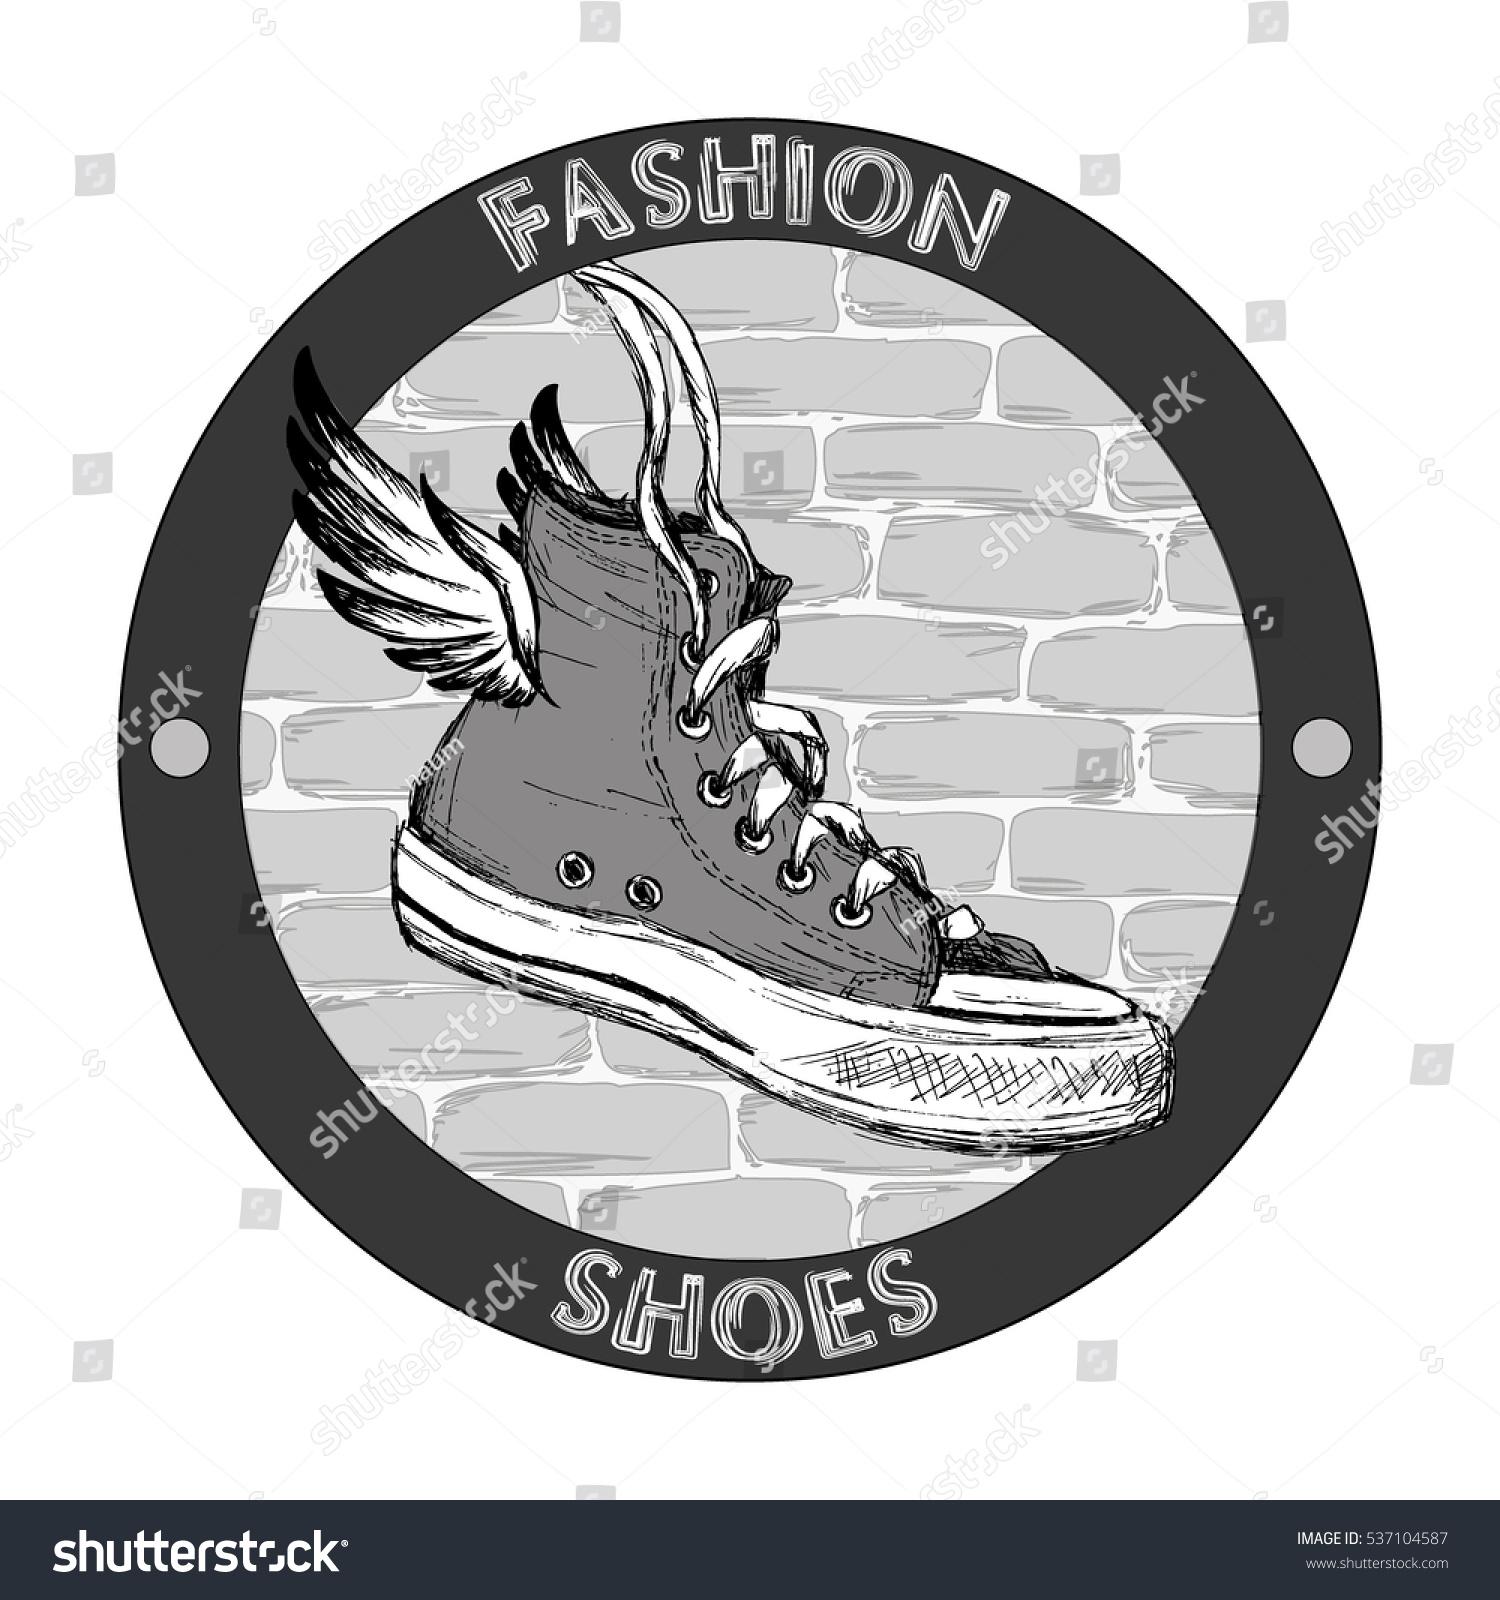 Hipster Gumshoe Wings Grunge Hand Drawn Stock Illustration 537104587